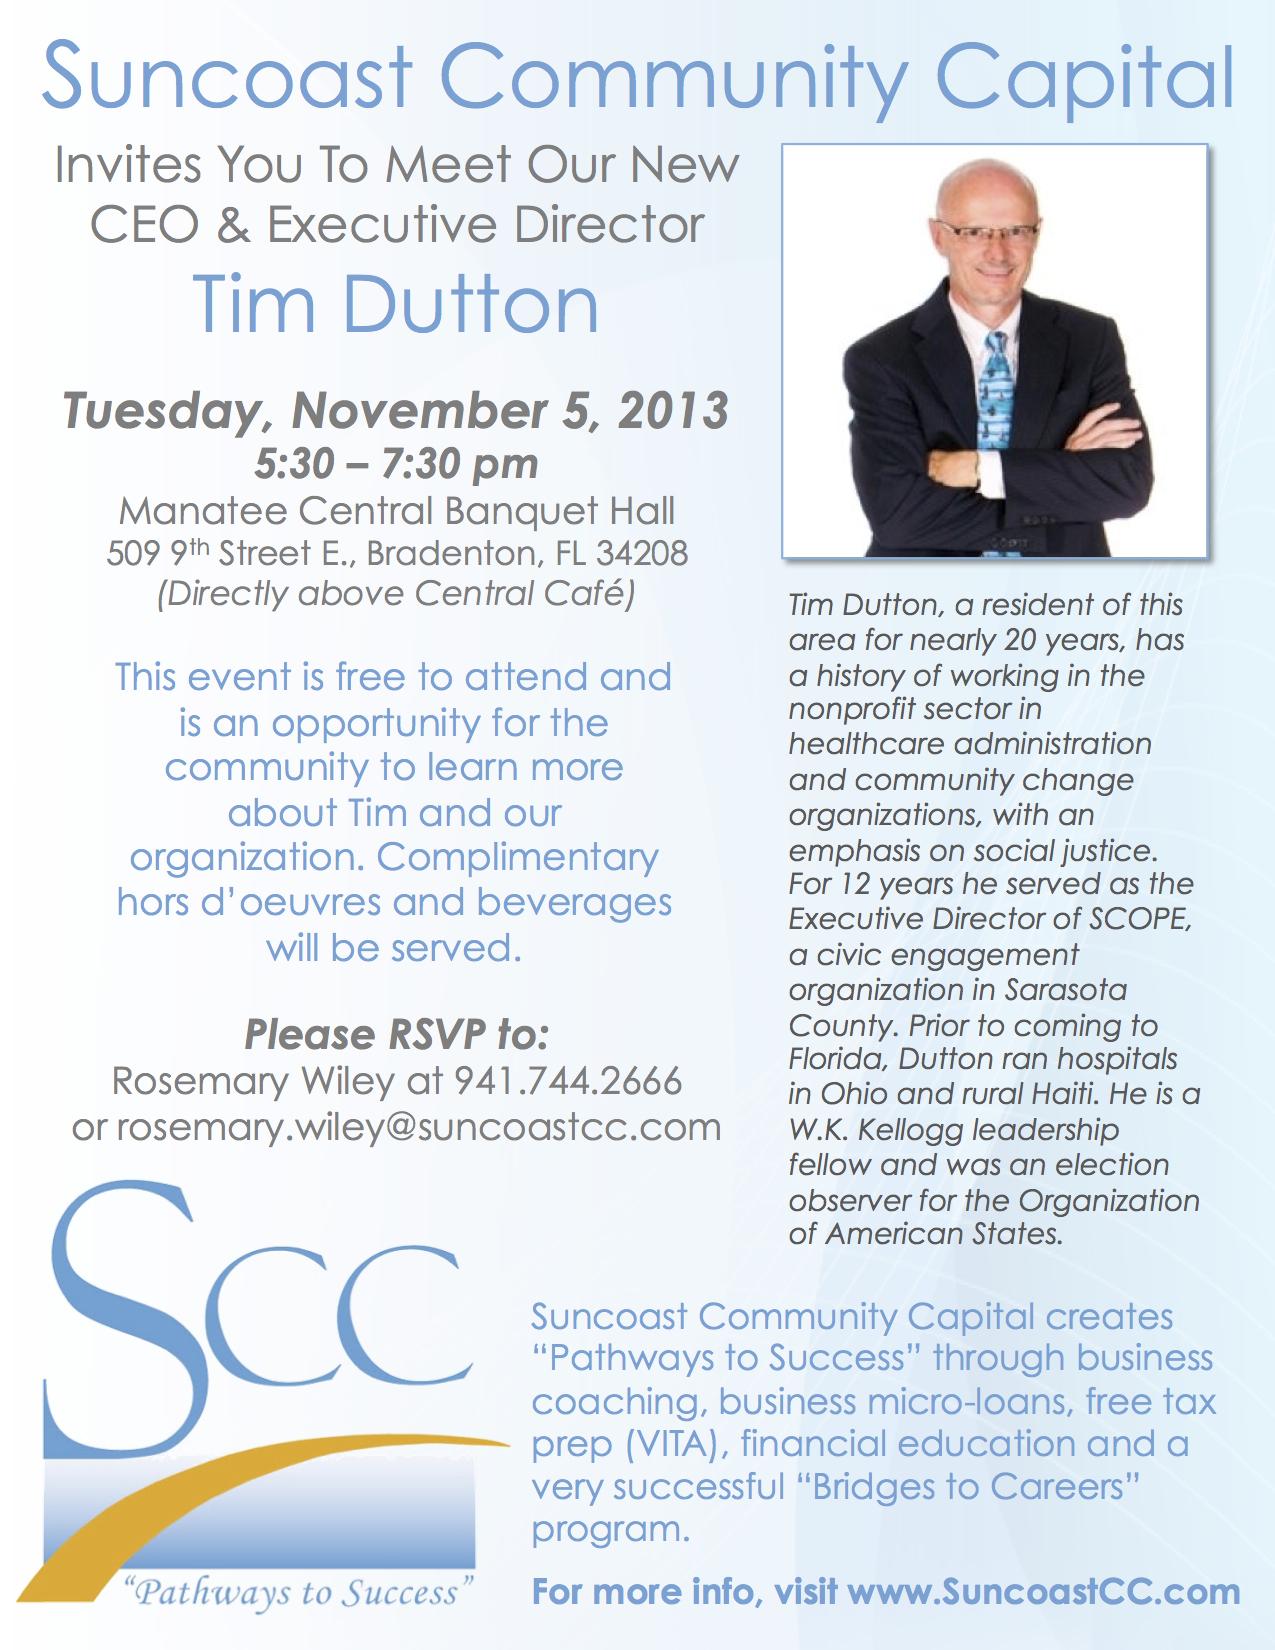 Meet & Greet Suncoast Community Capital Executive Director Tim Dutton |  Bradenton, FL Patch